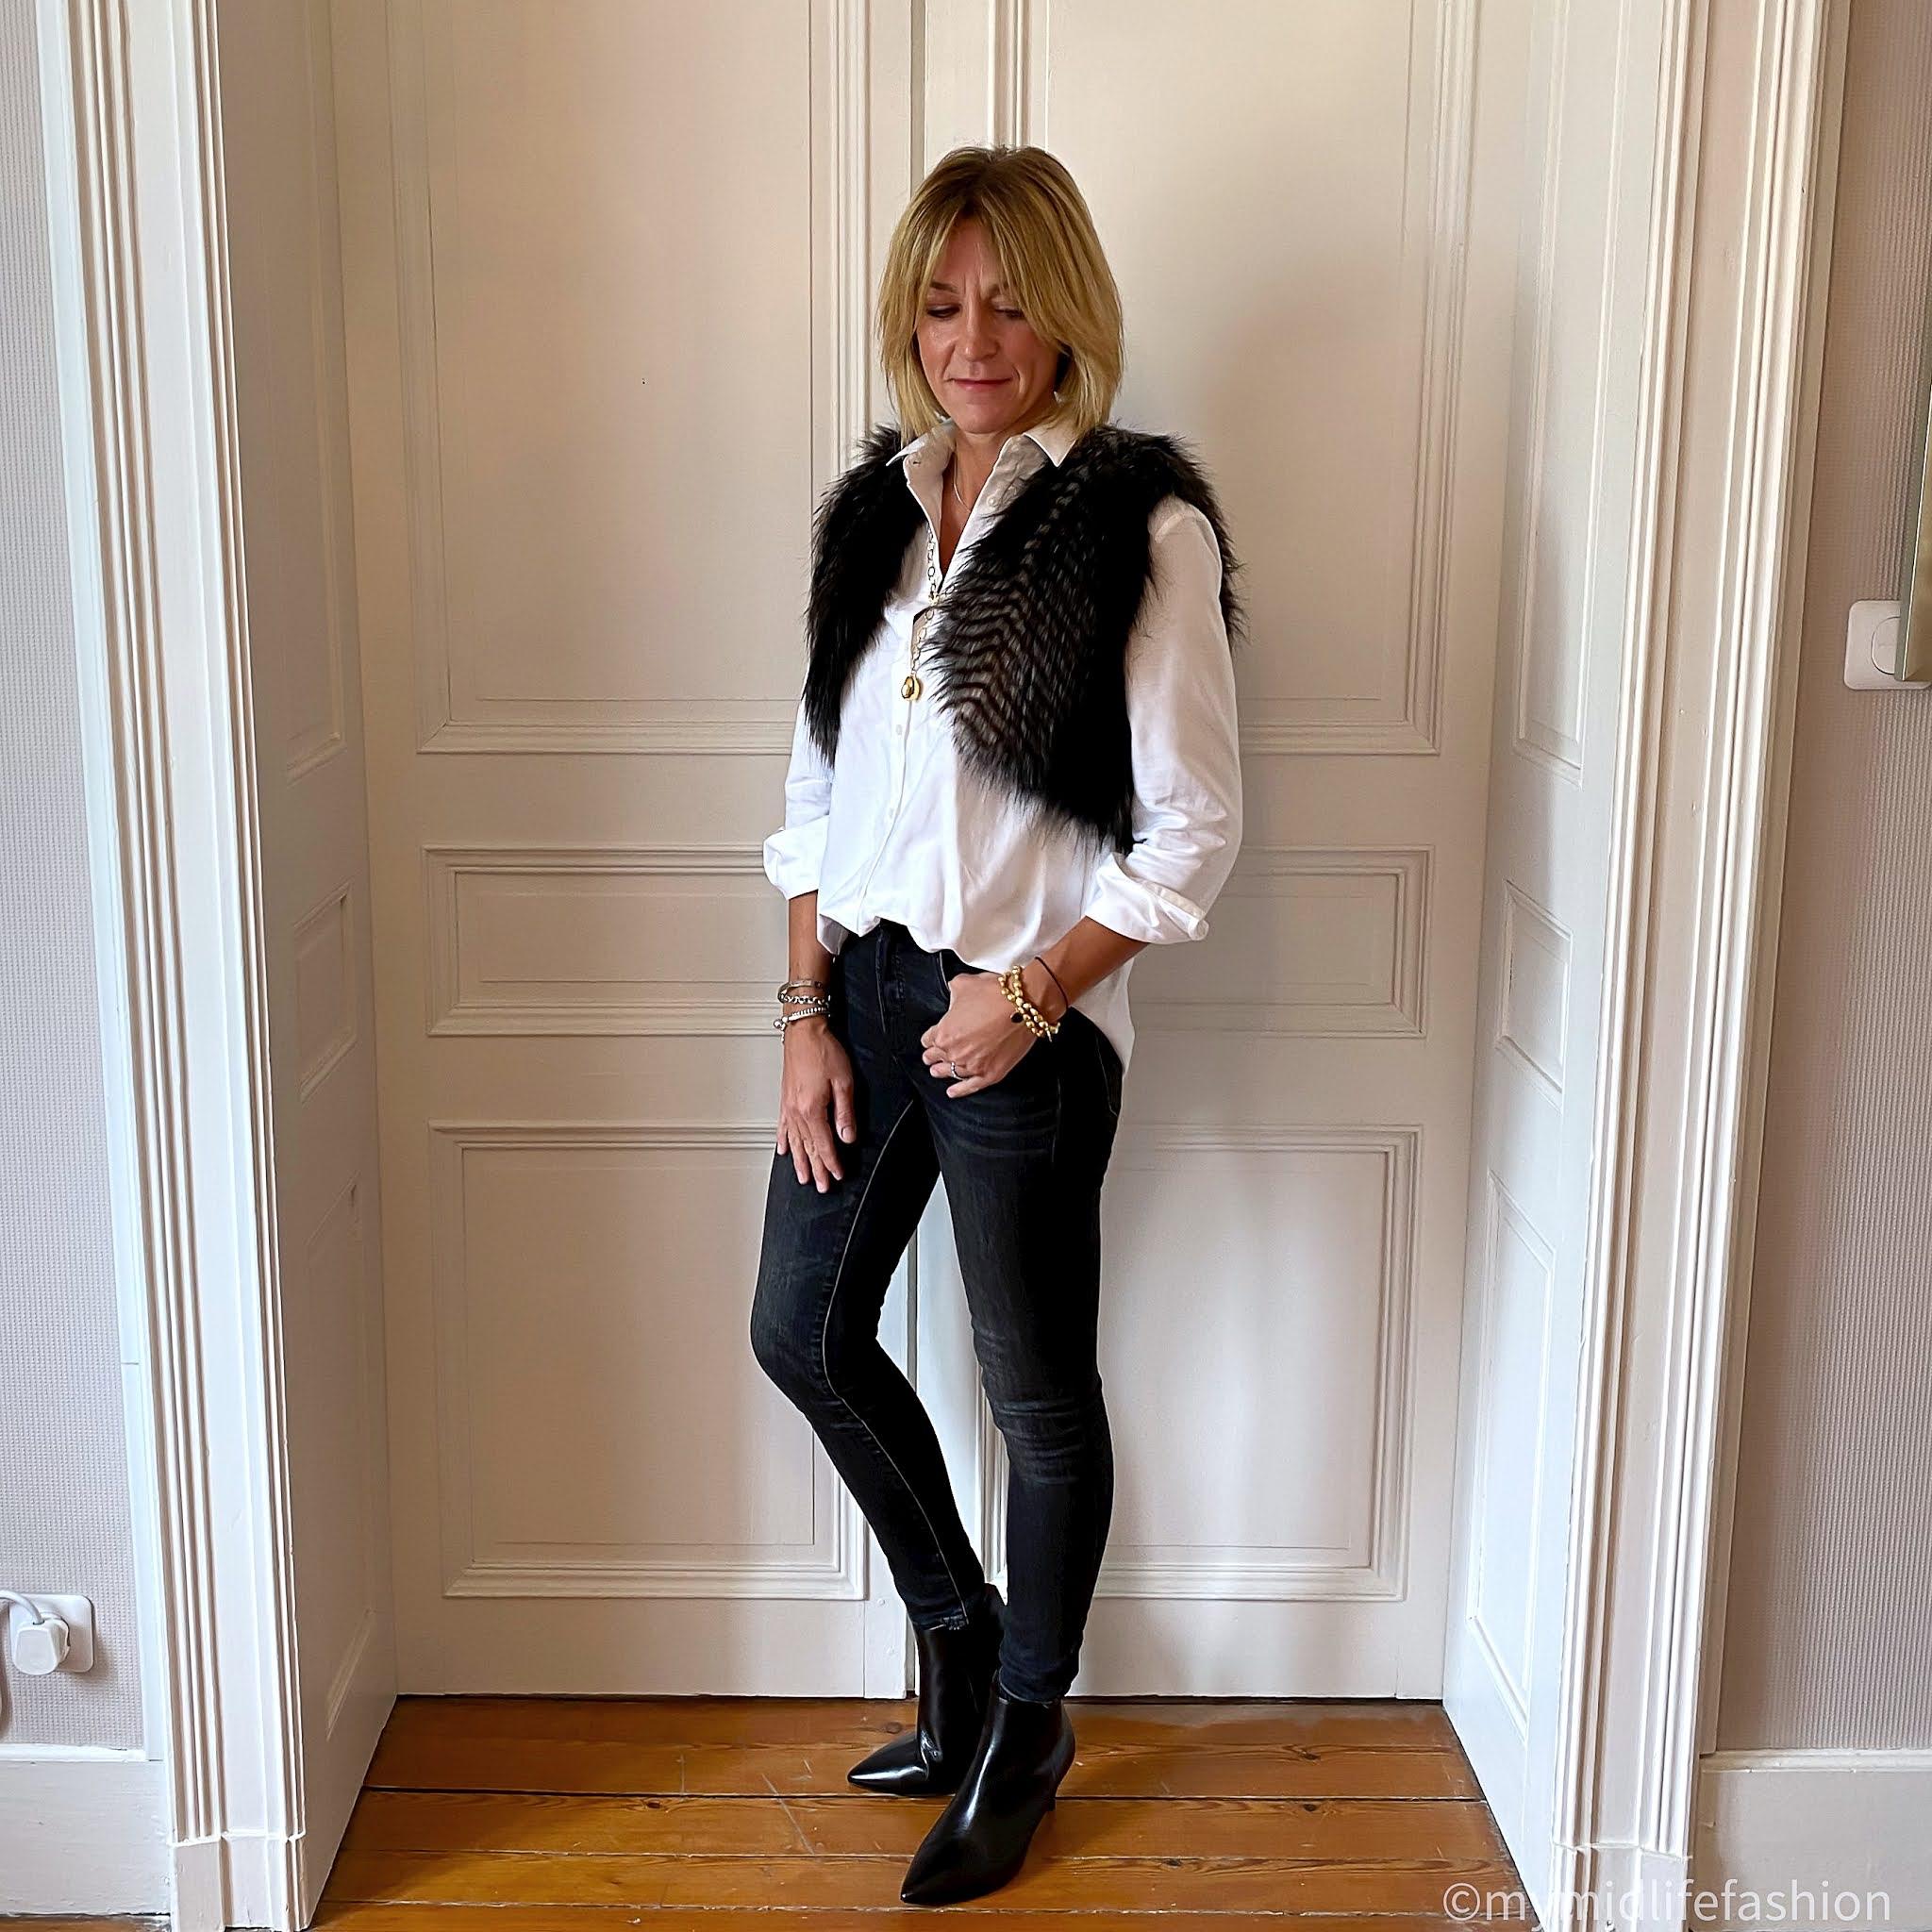 my midlife fashion, ashiana Perla chain necklace, ashiana black onyx coin bracelets, Helen Moore shrug, baukjen heather shirt, j crew 9 inch toothpick skinny jeans, sole bliss Brooklyn ankle boots